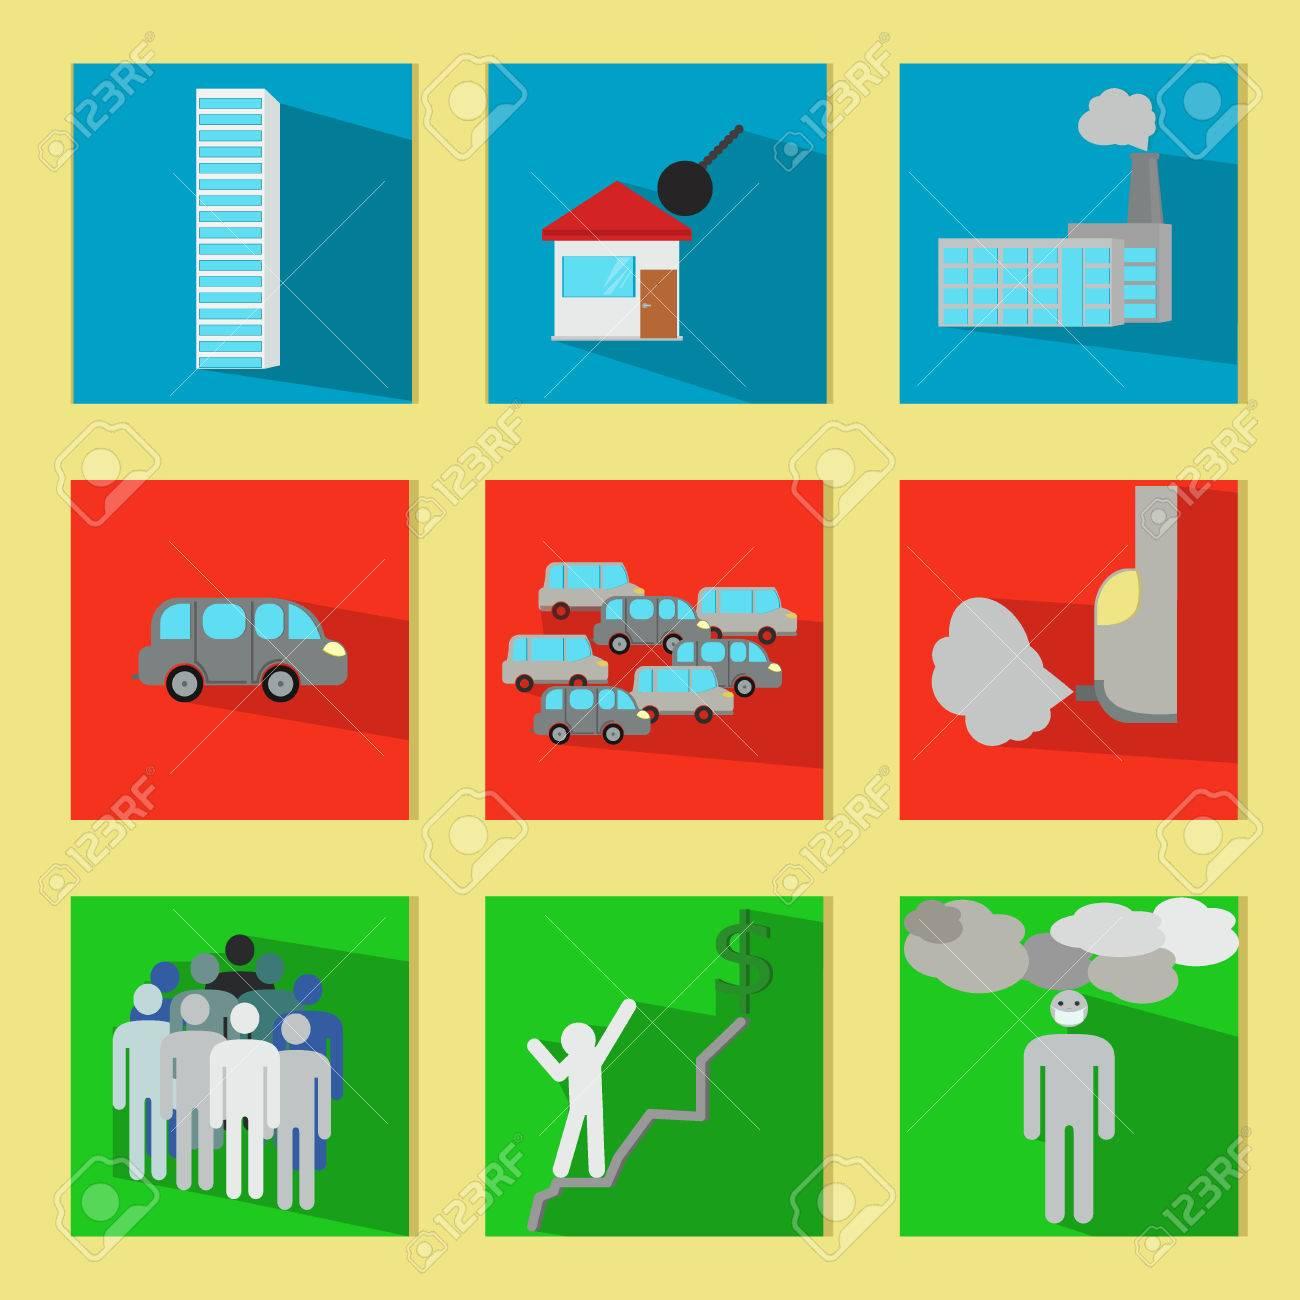 business administration consumerism urban life concepts house business life concepts